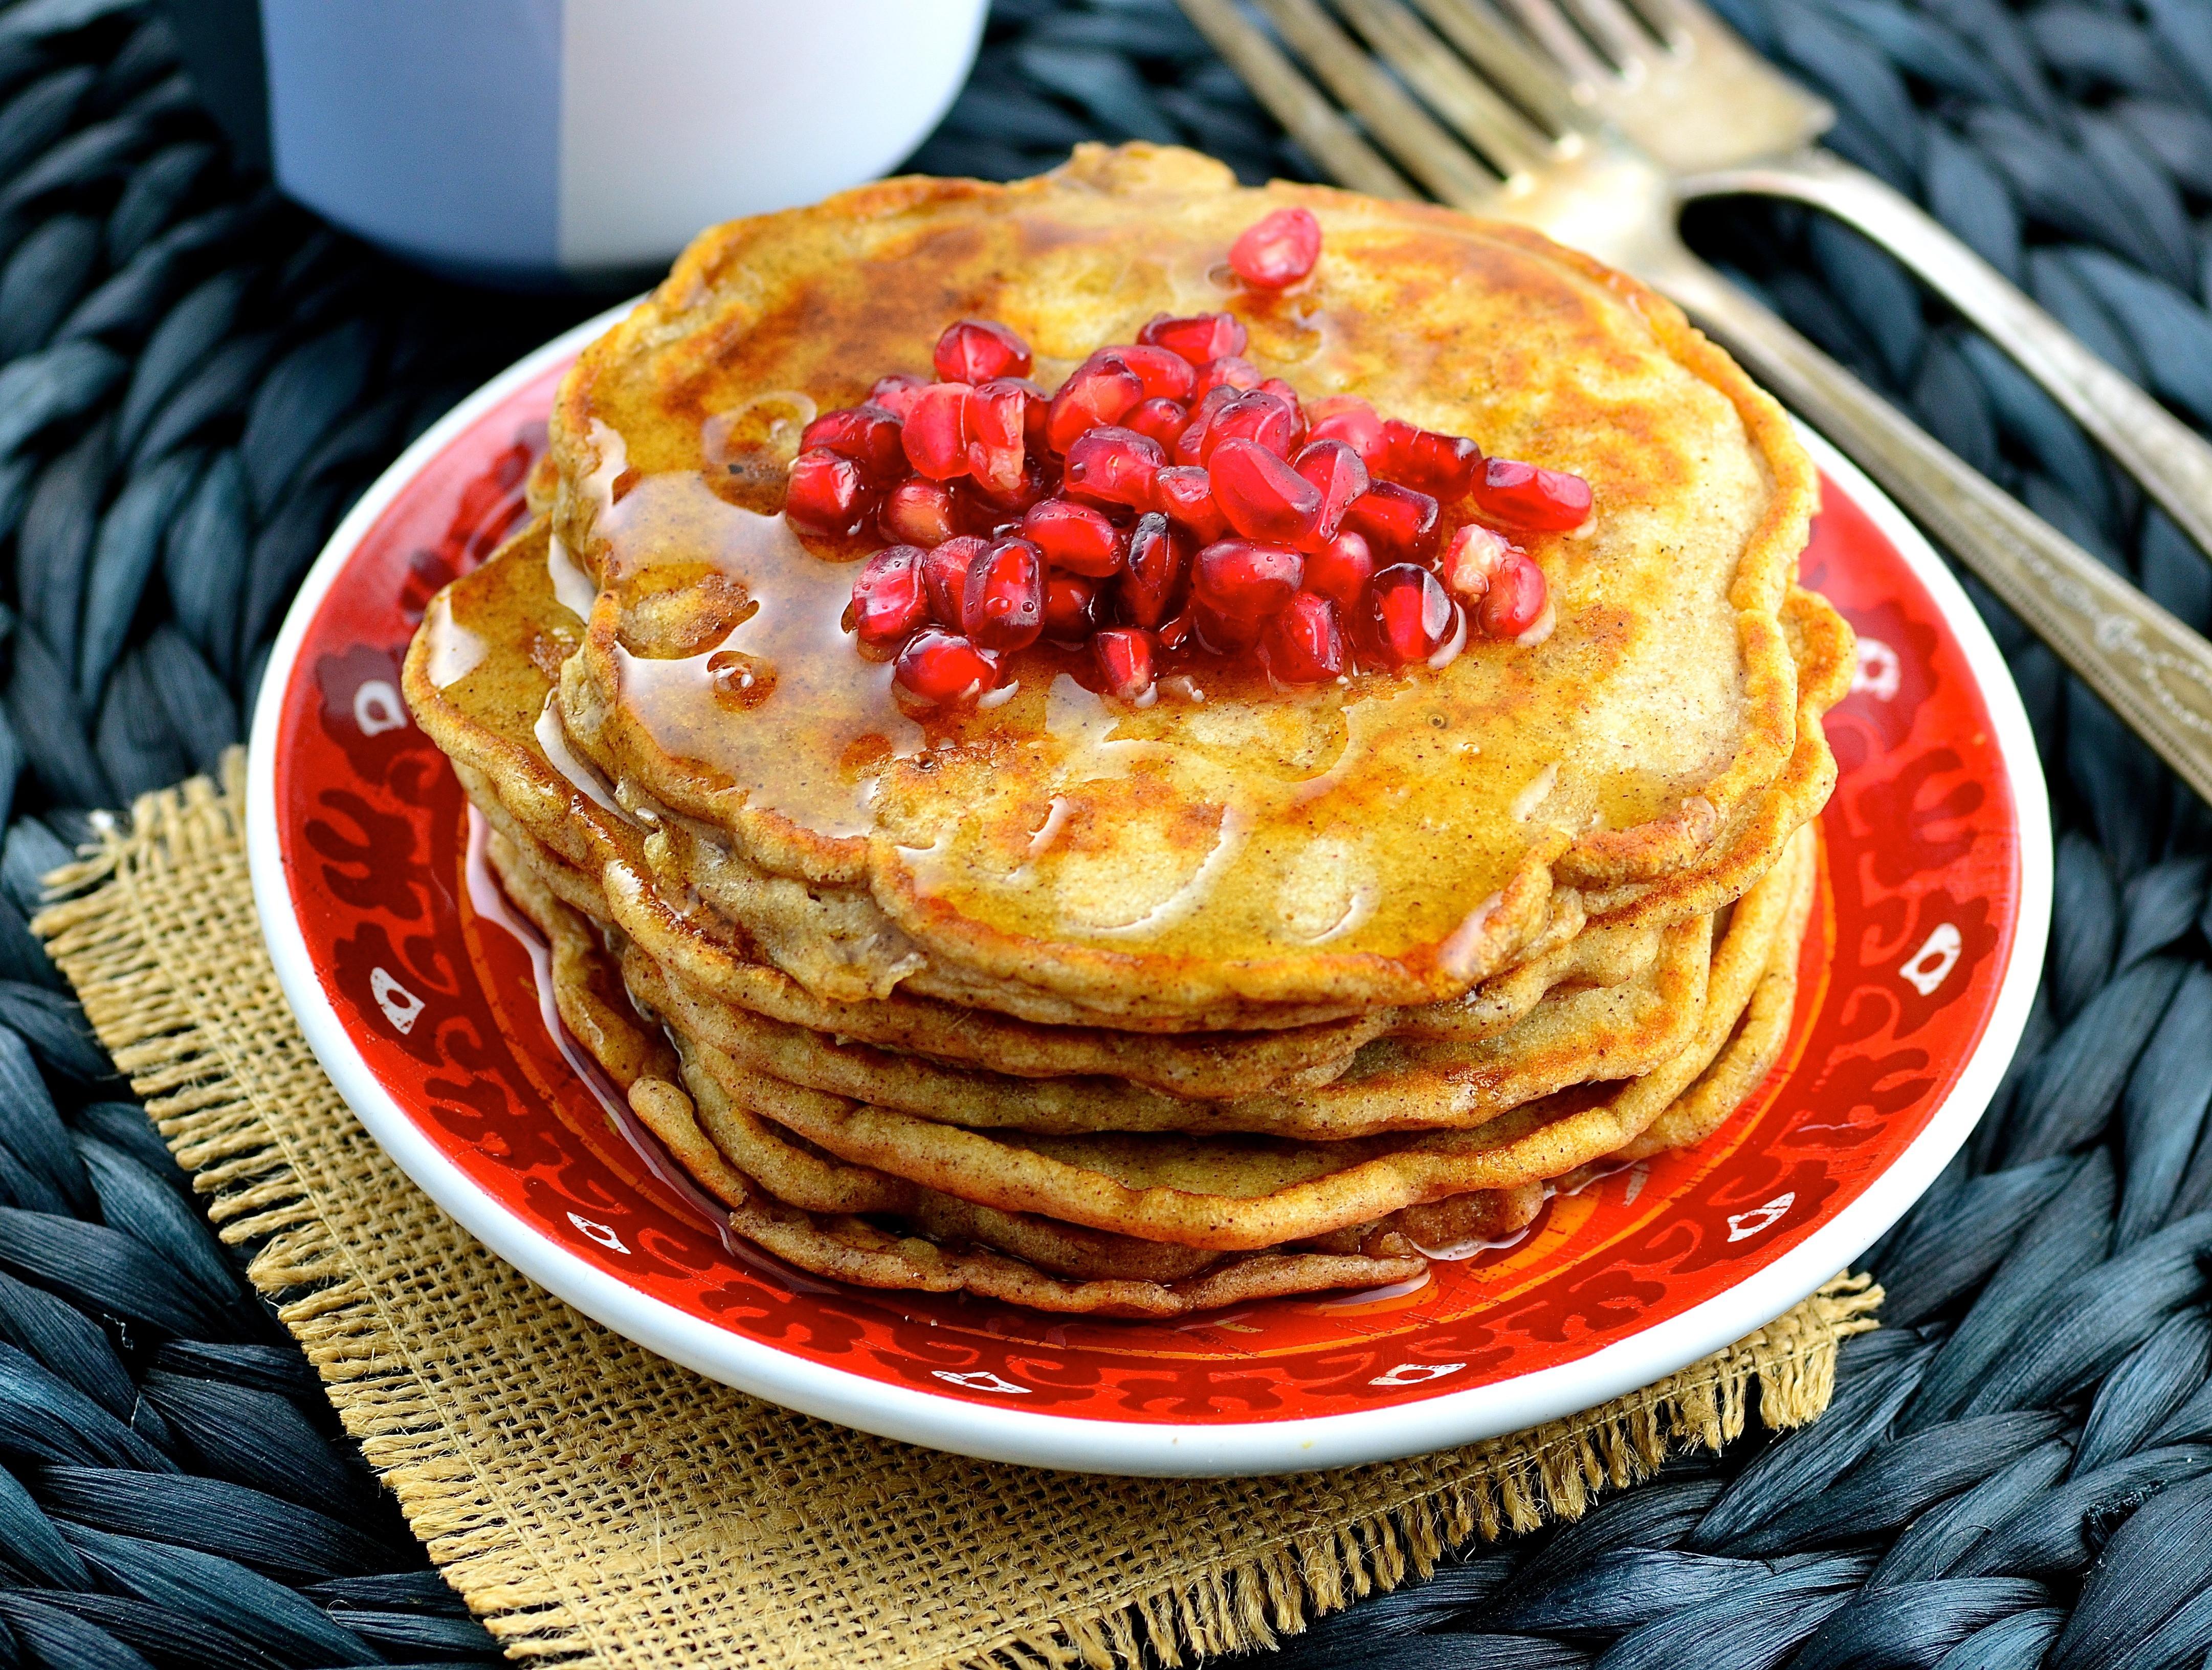 Breakfast Food Recipes  Weight Watchers Breakfast Recipes Food